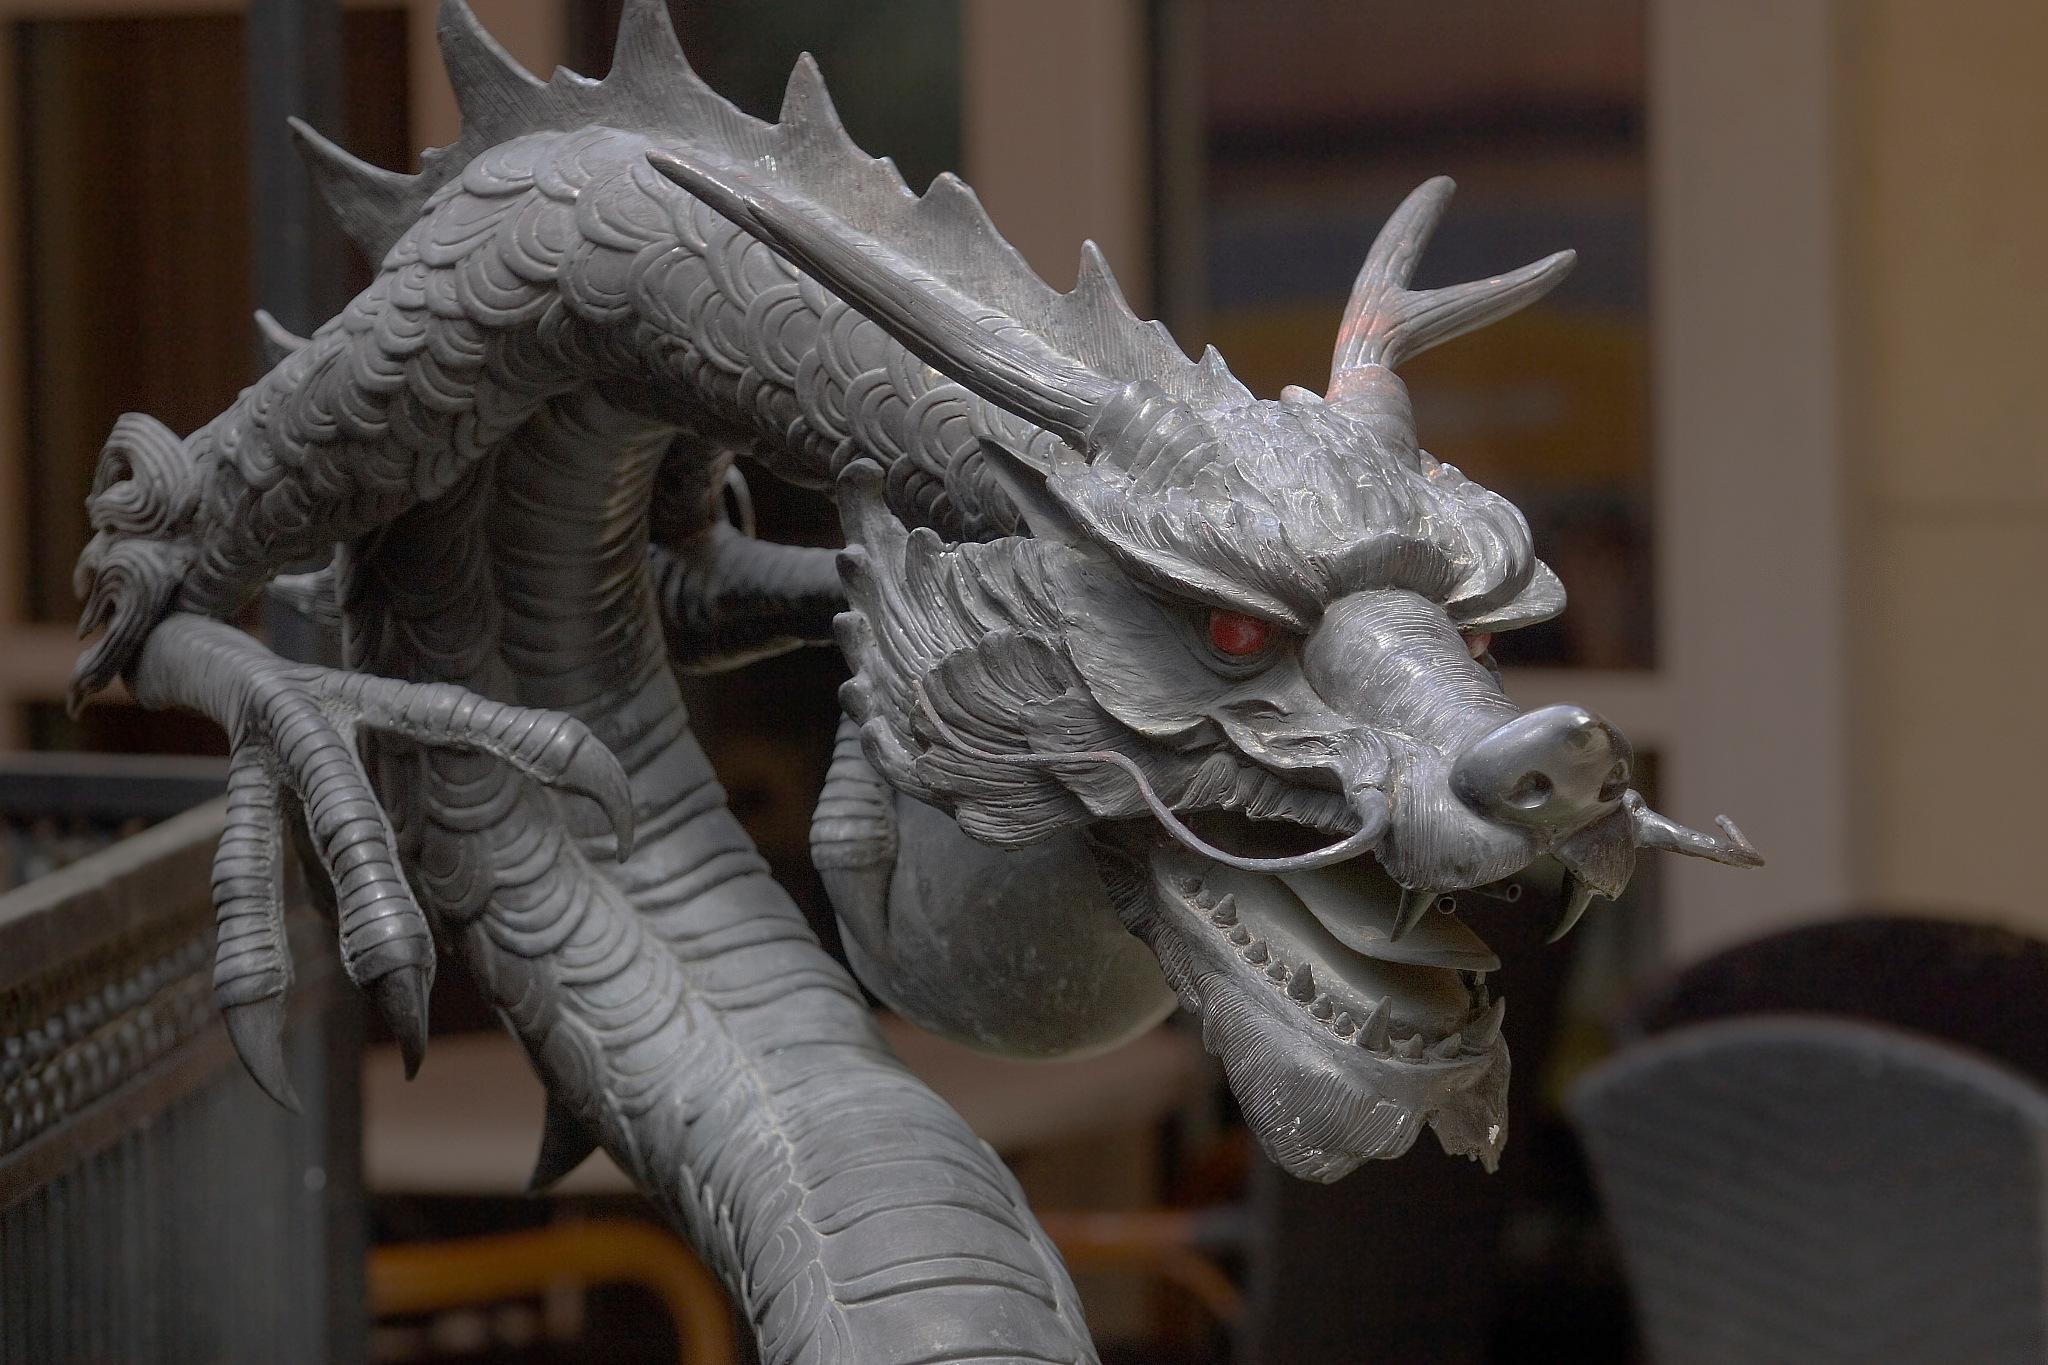 zsa dragon by Kevin Palmer